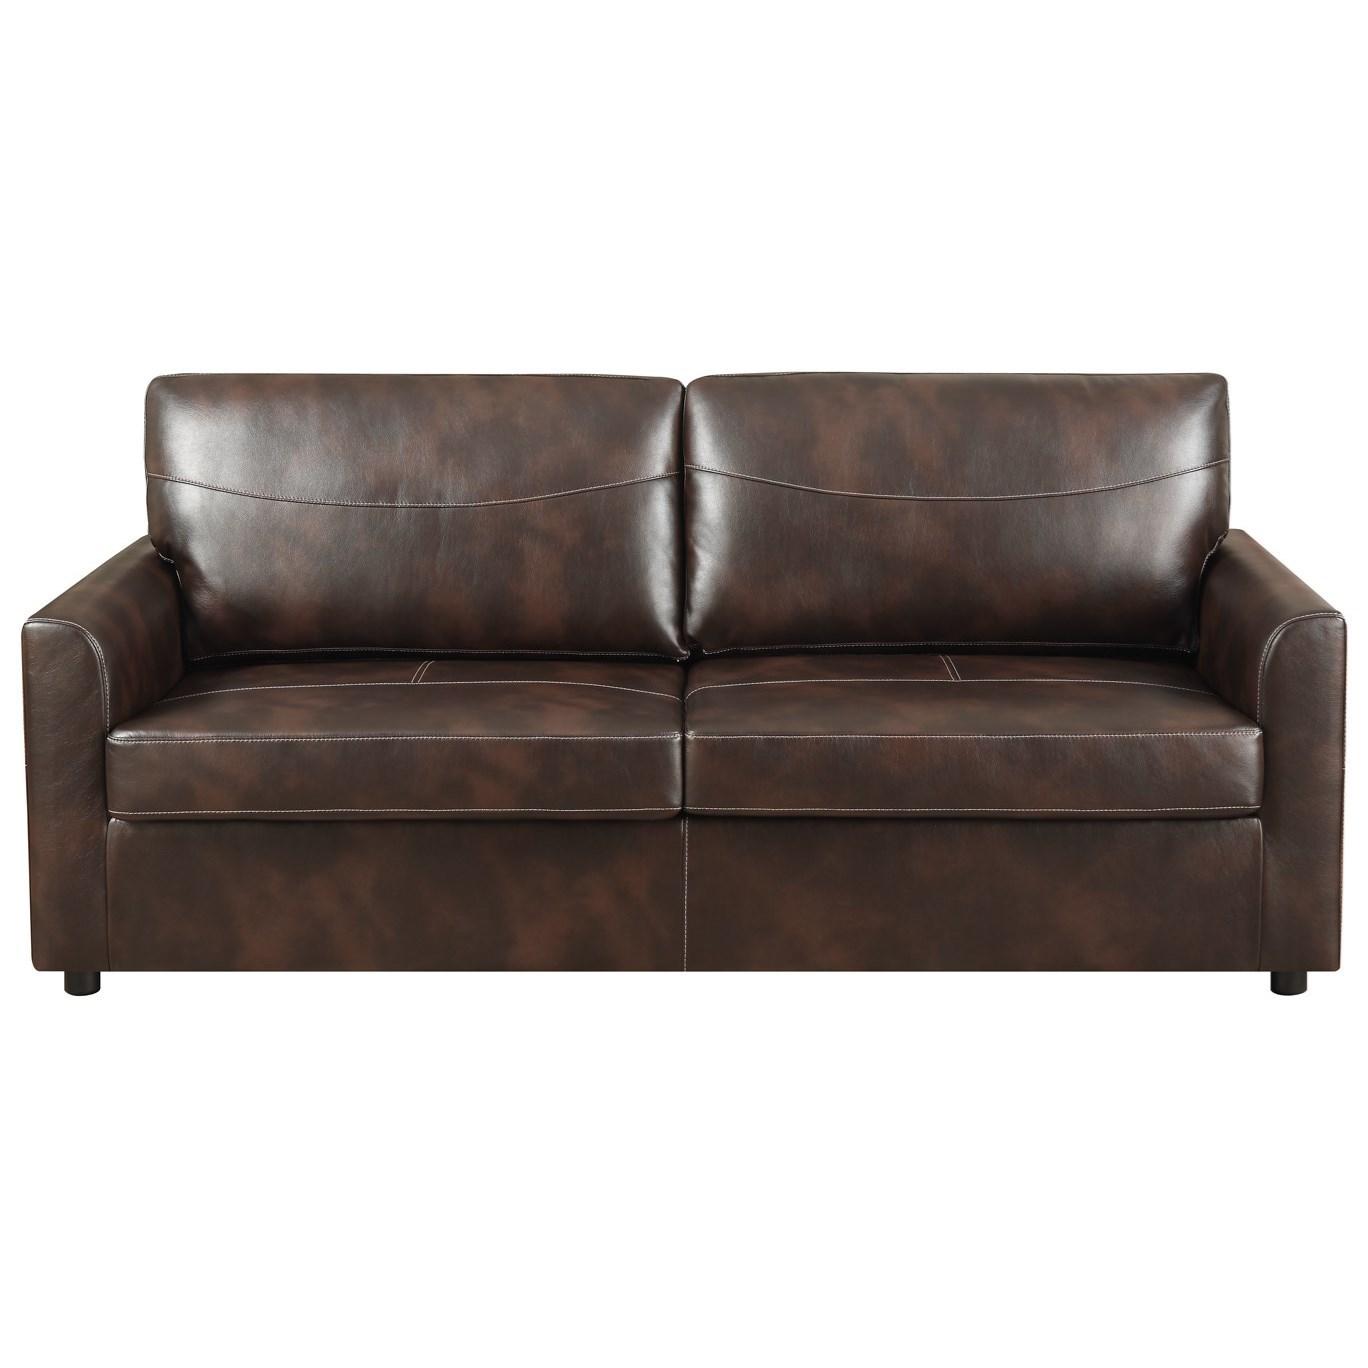 Slumber Full Sleeper Sofa w/ Gel Foam Mattress by Emerald at Suburban Furniture